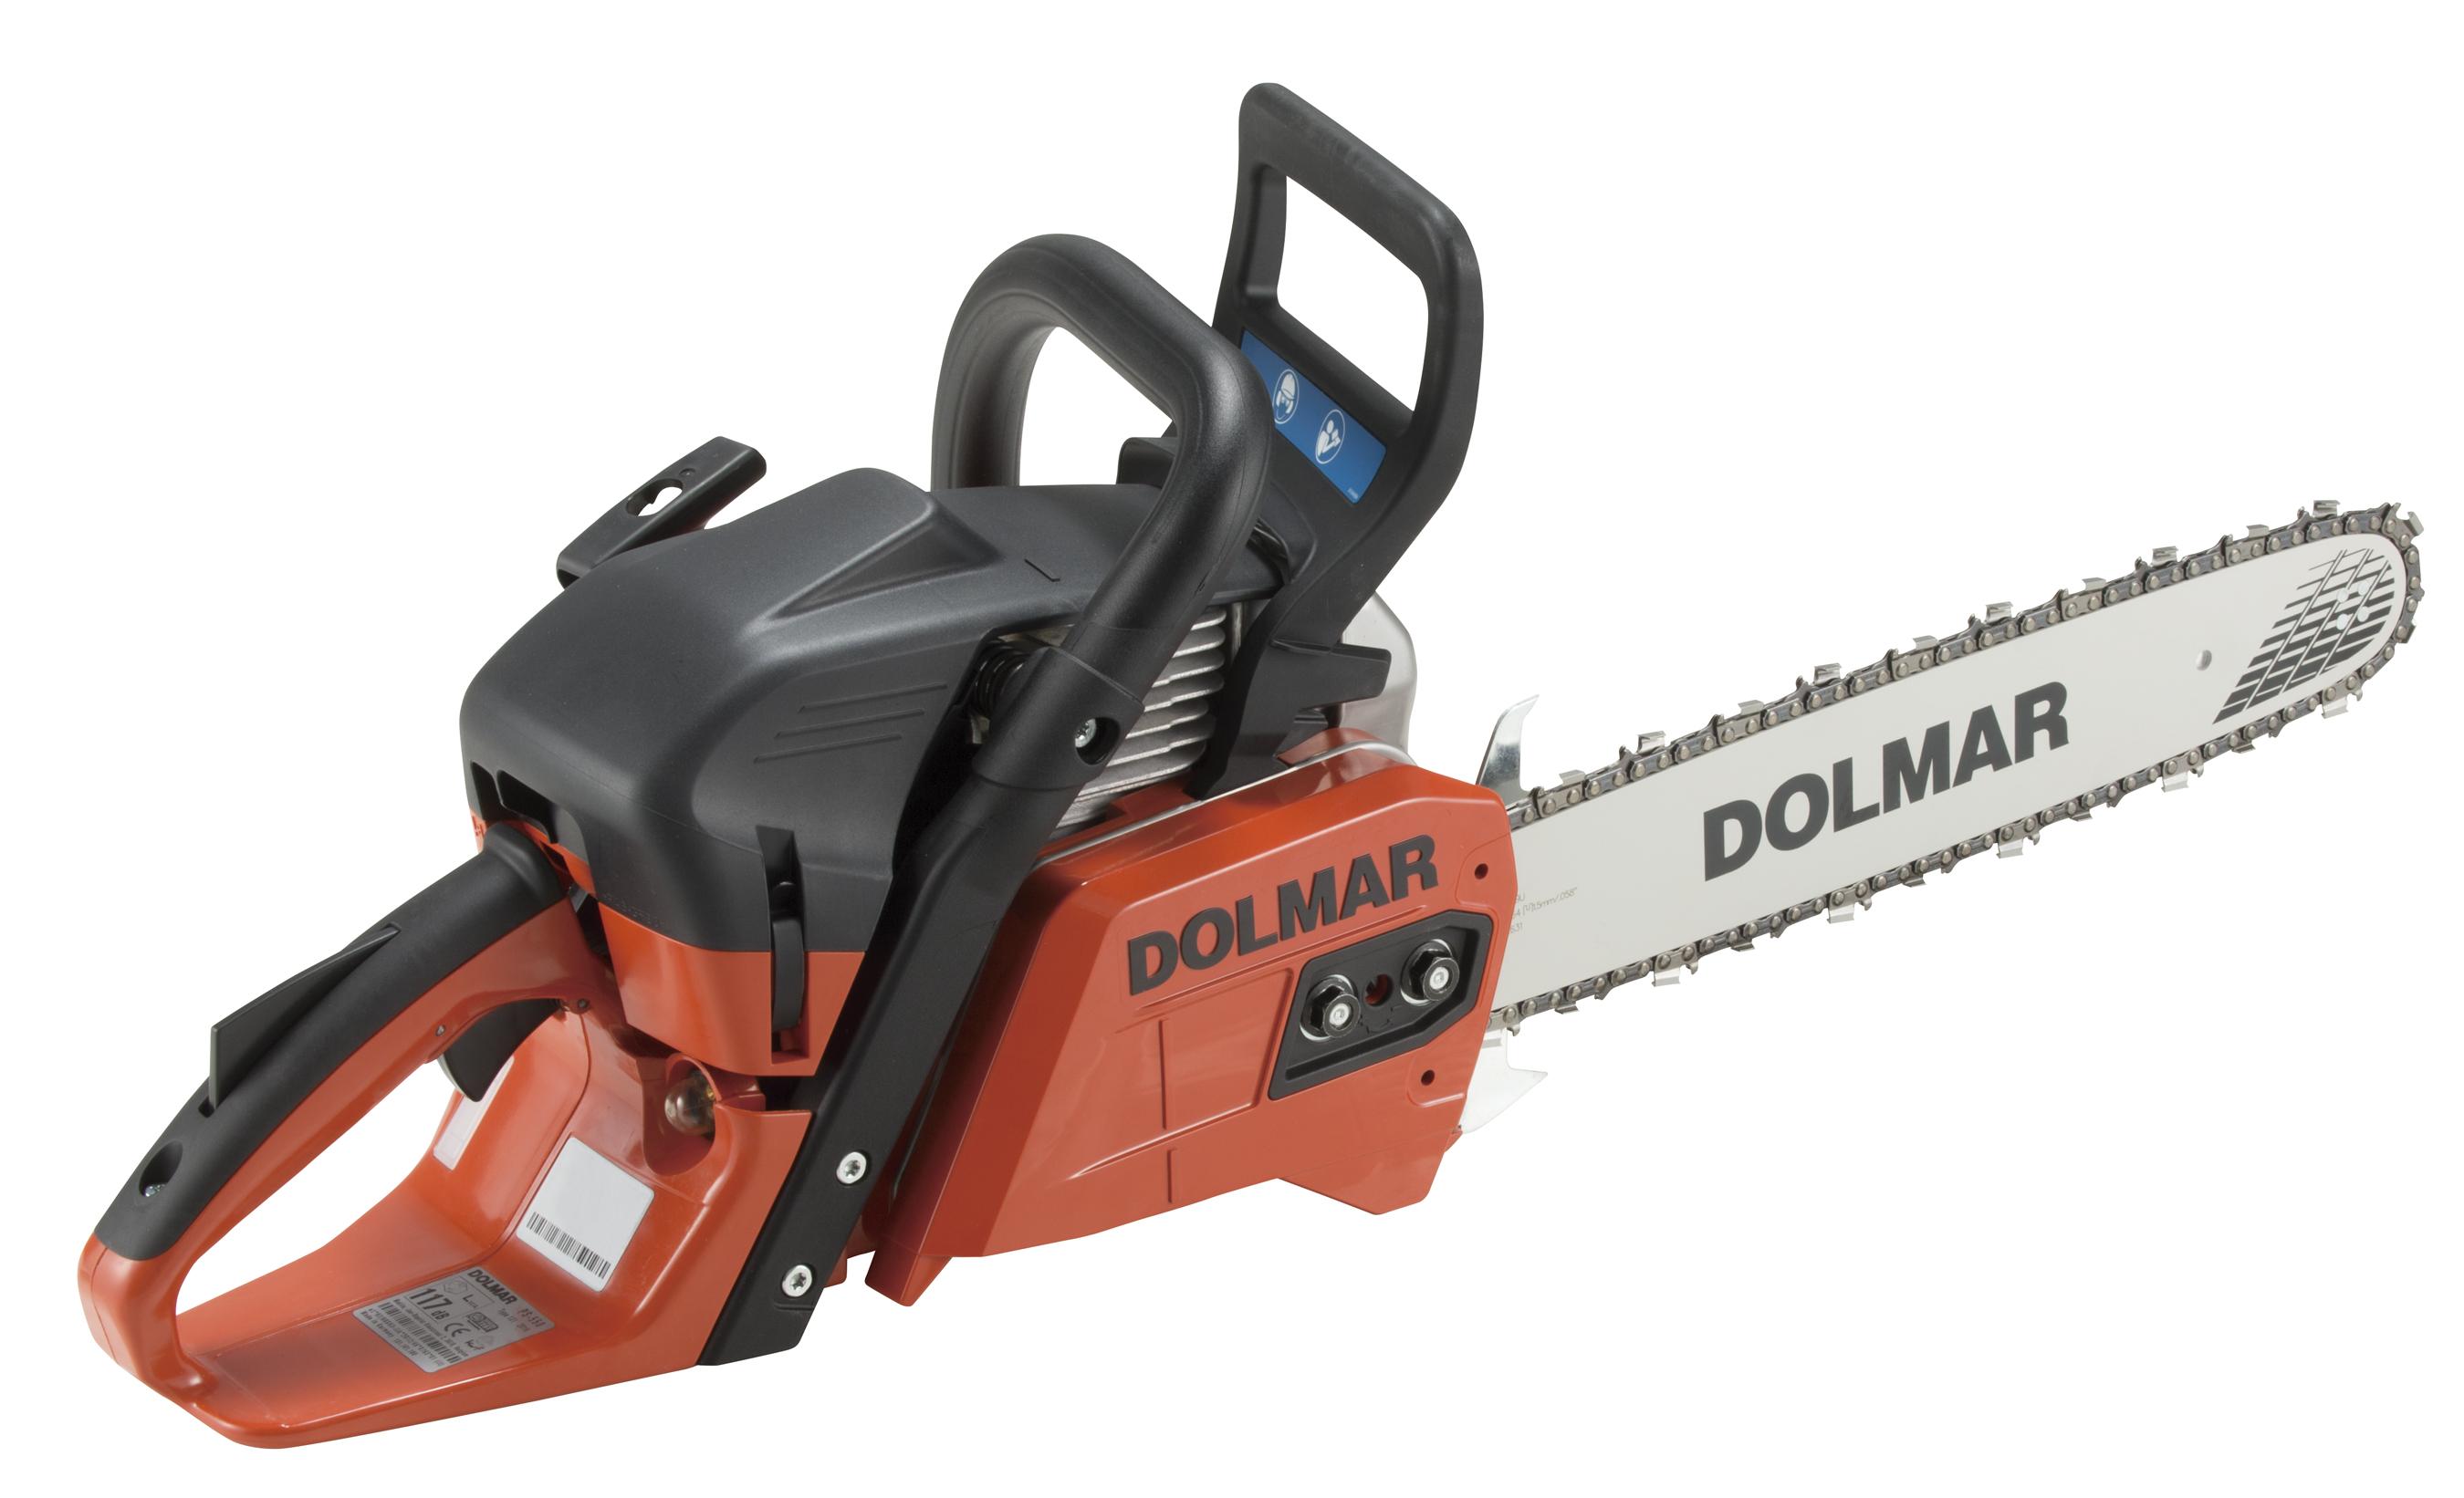 Benzin Kettensäge / Motorsäge Dolmar PS550-38 38cm Bild 1